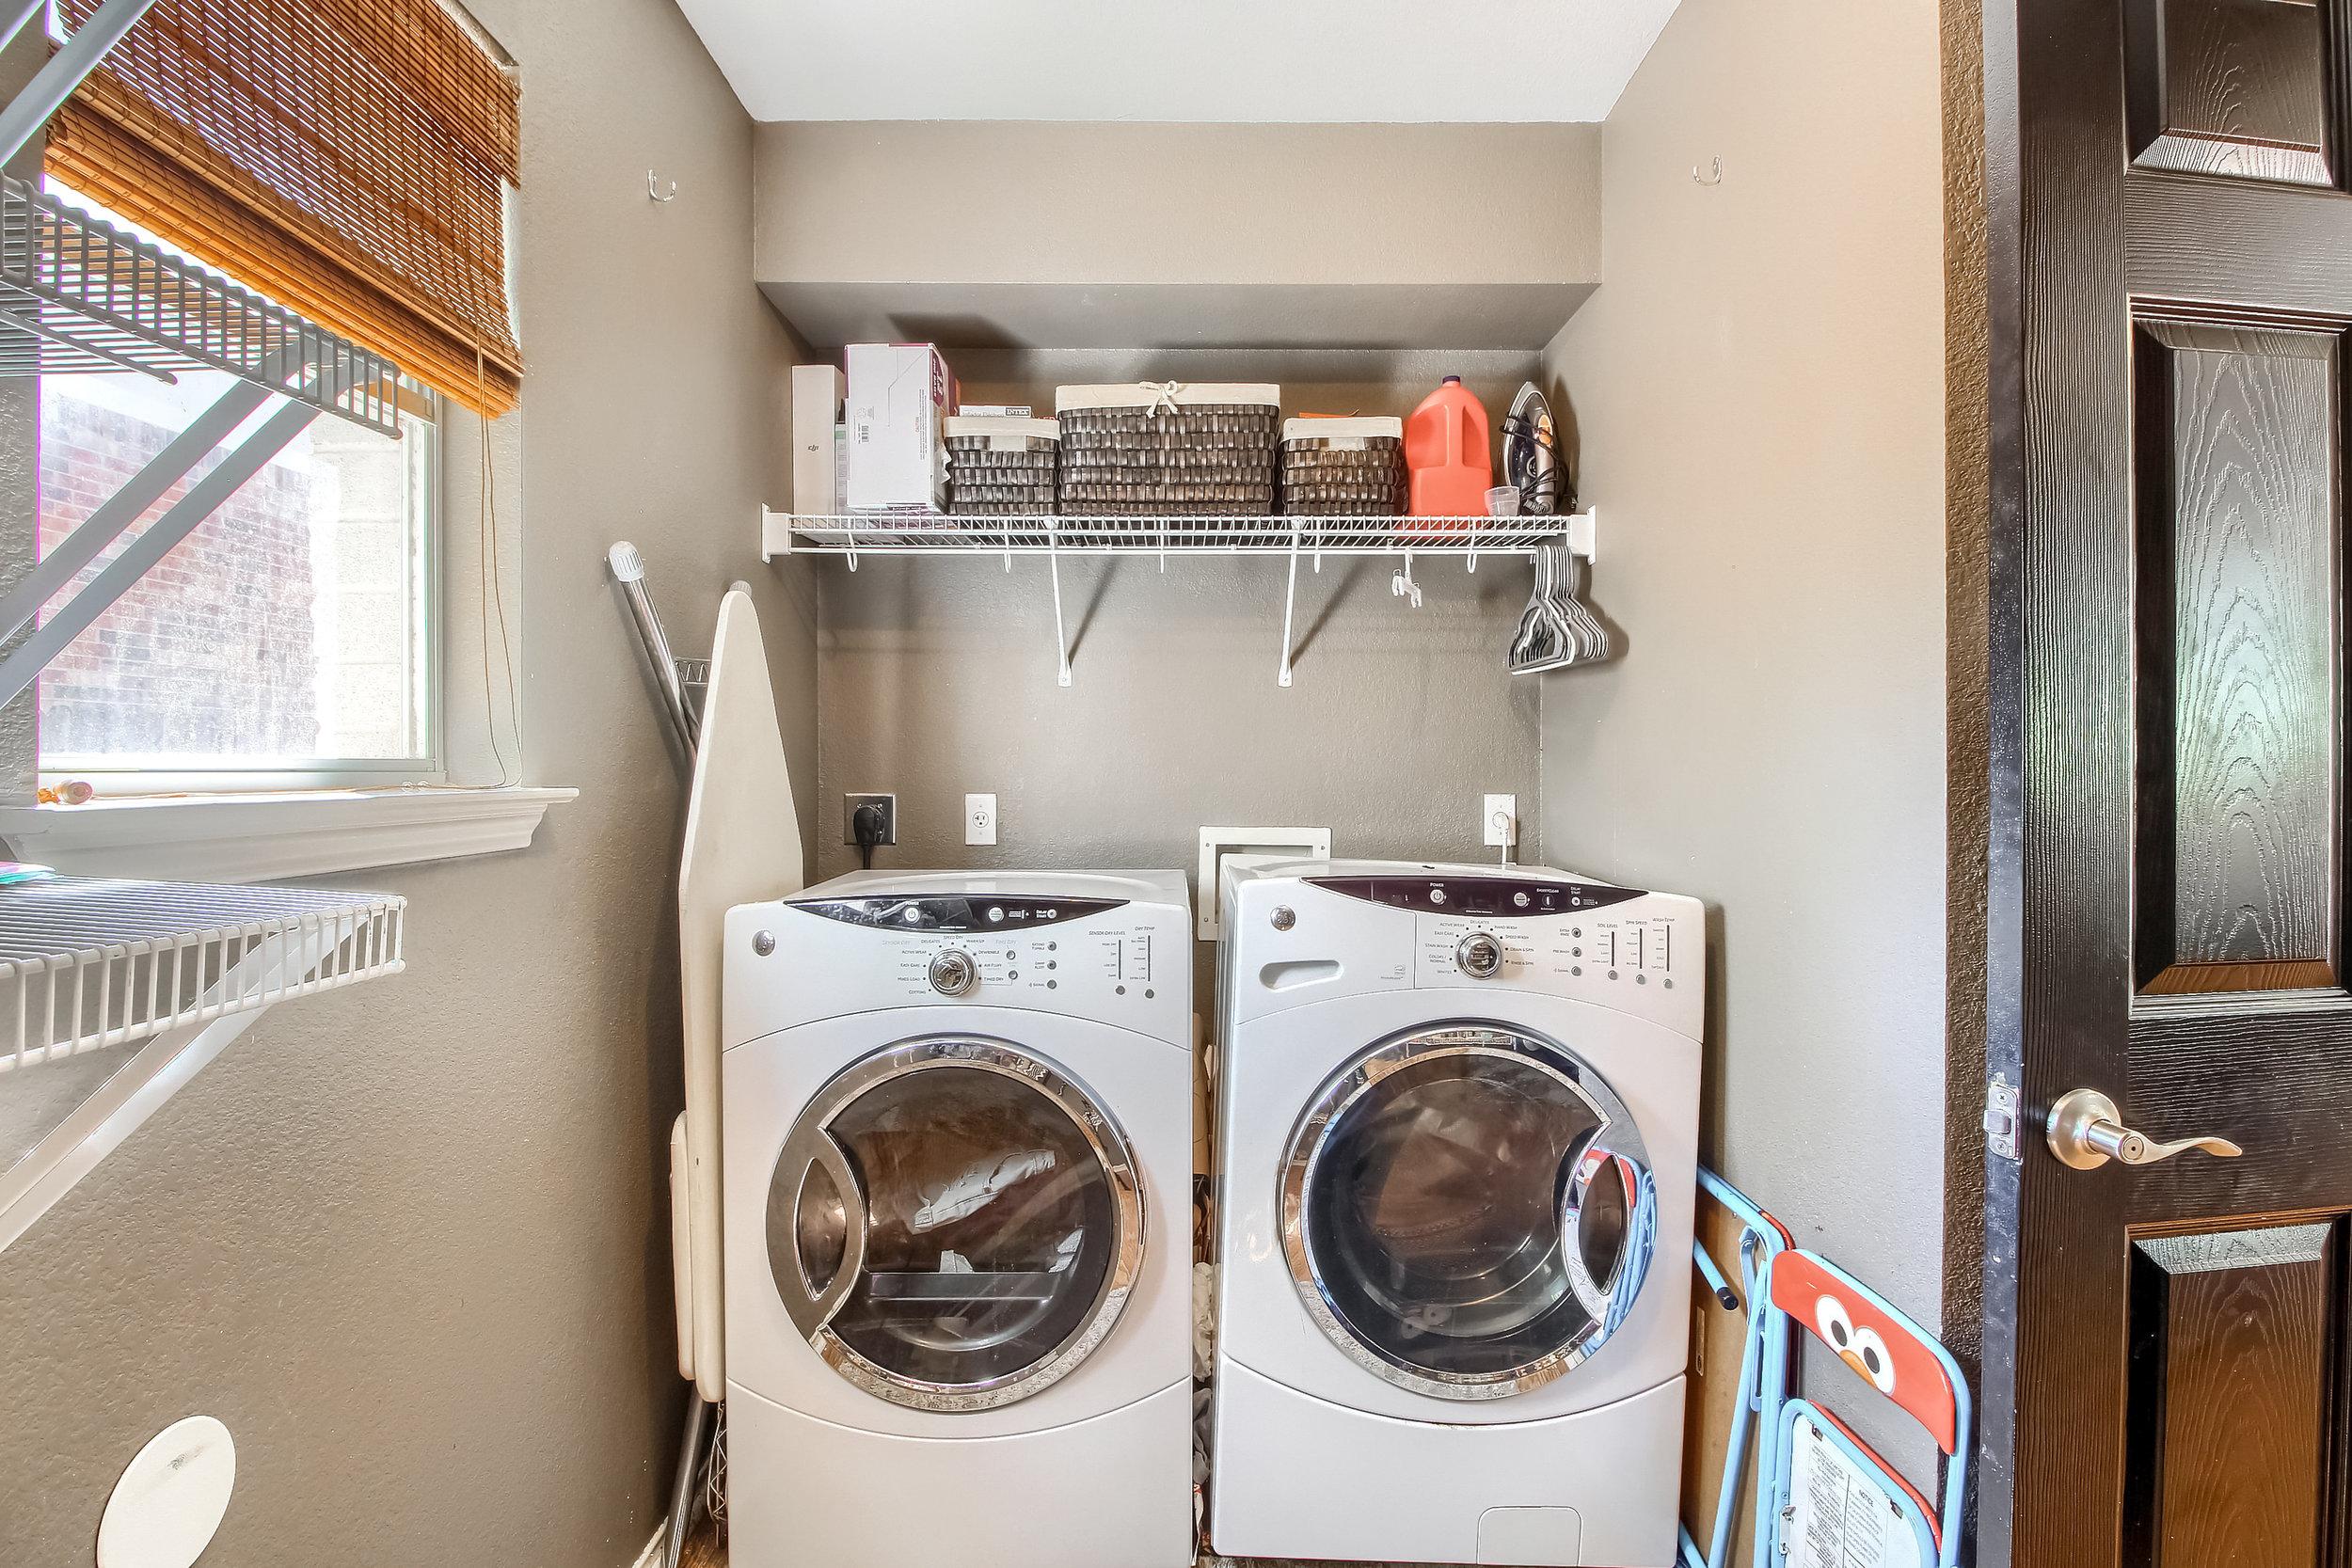 13_Laundry_Room_IMG_2724.JPG